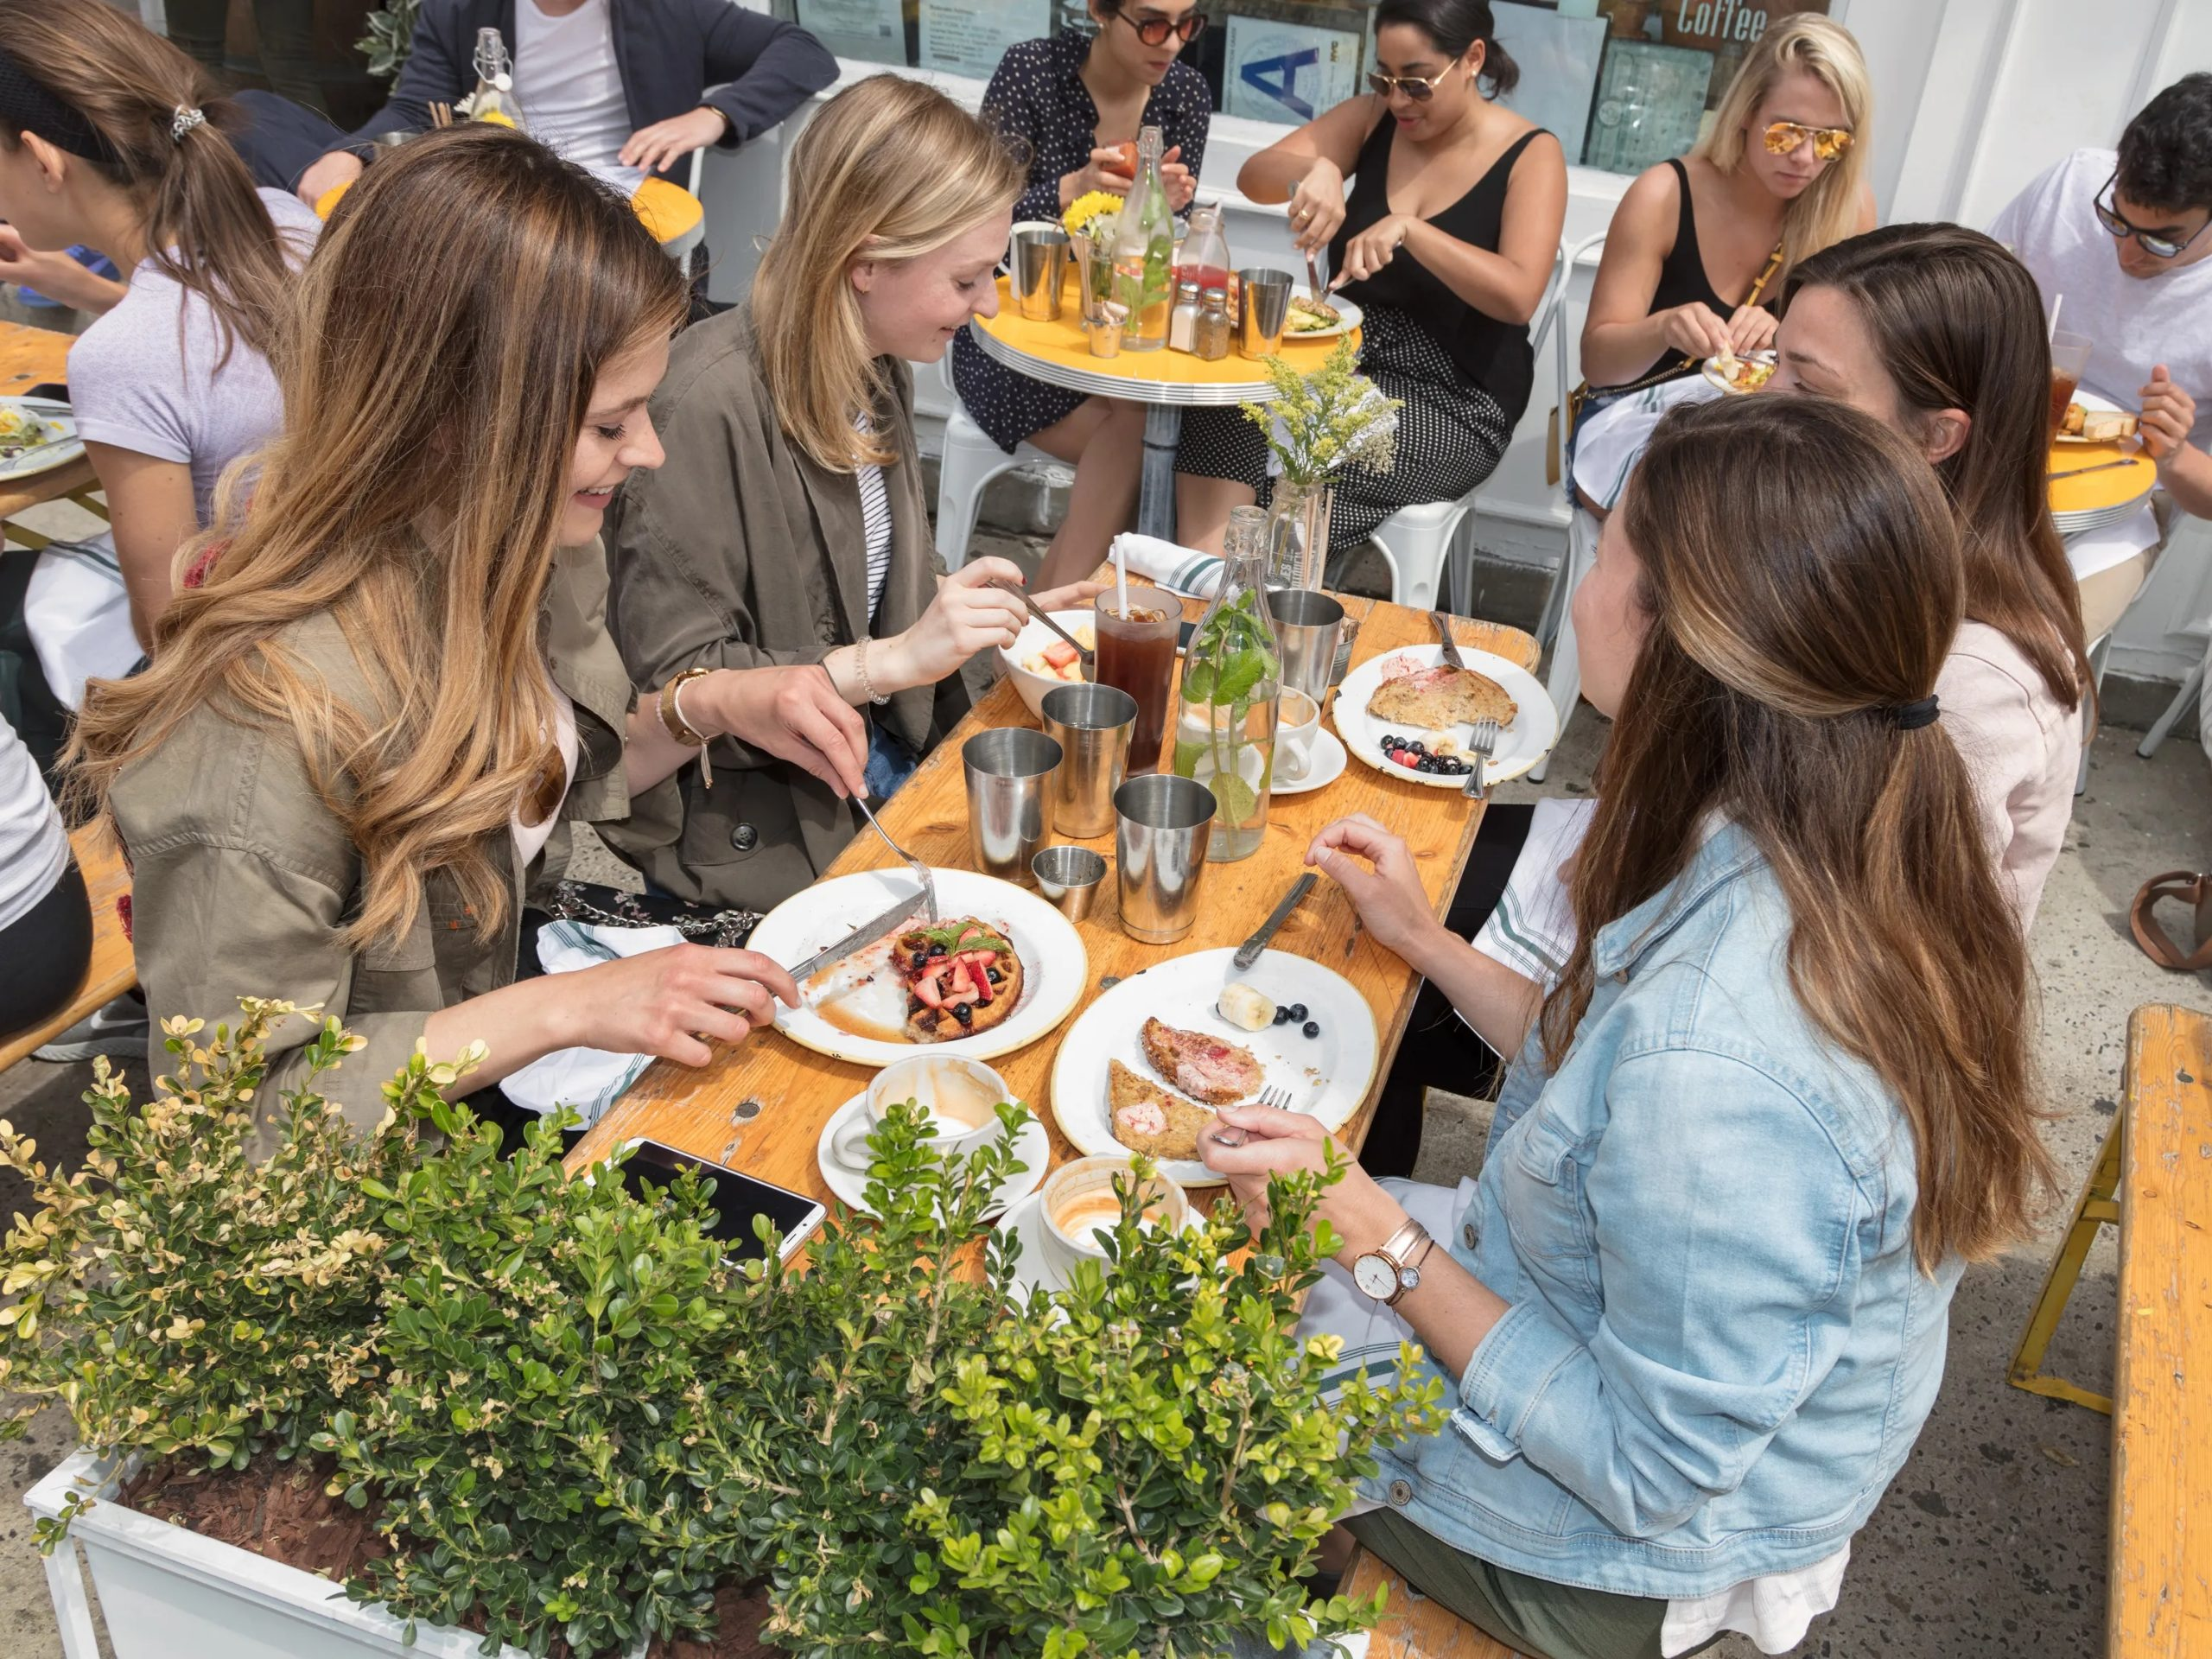 Inilah Keseruan Hangout di Café Rooftop Keywest USA